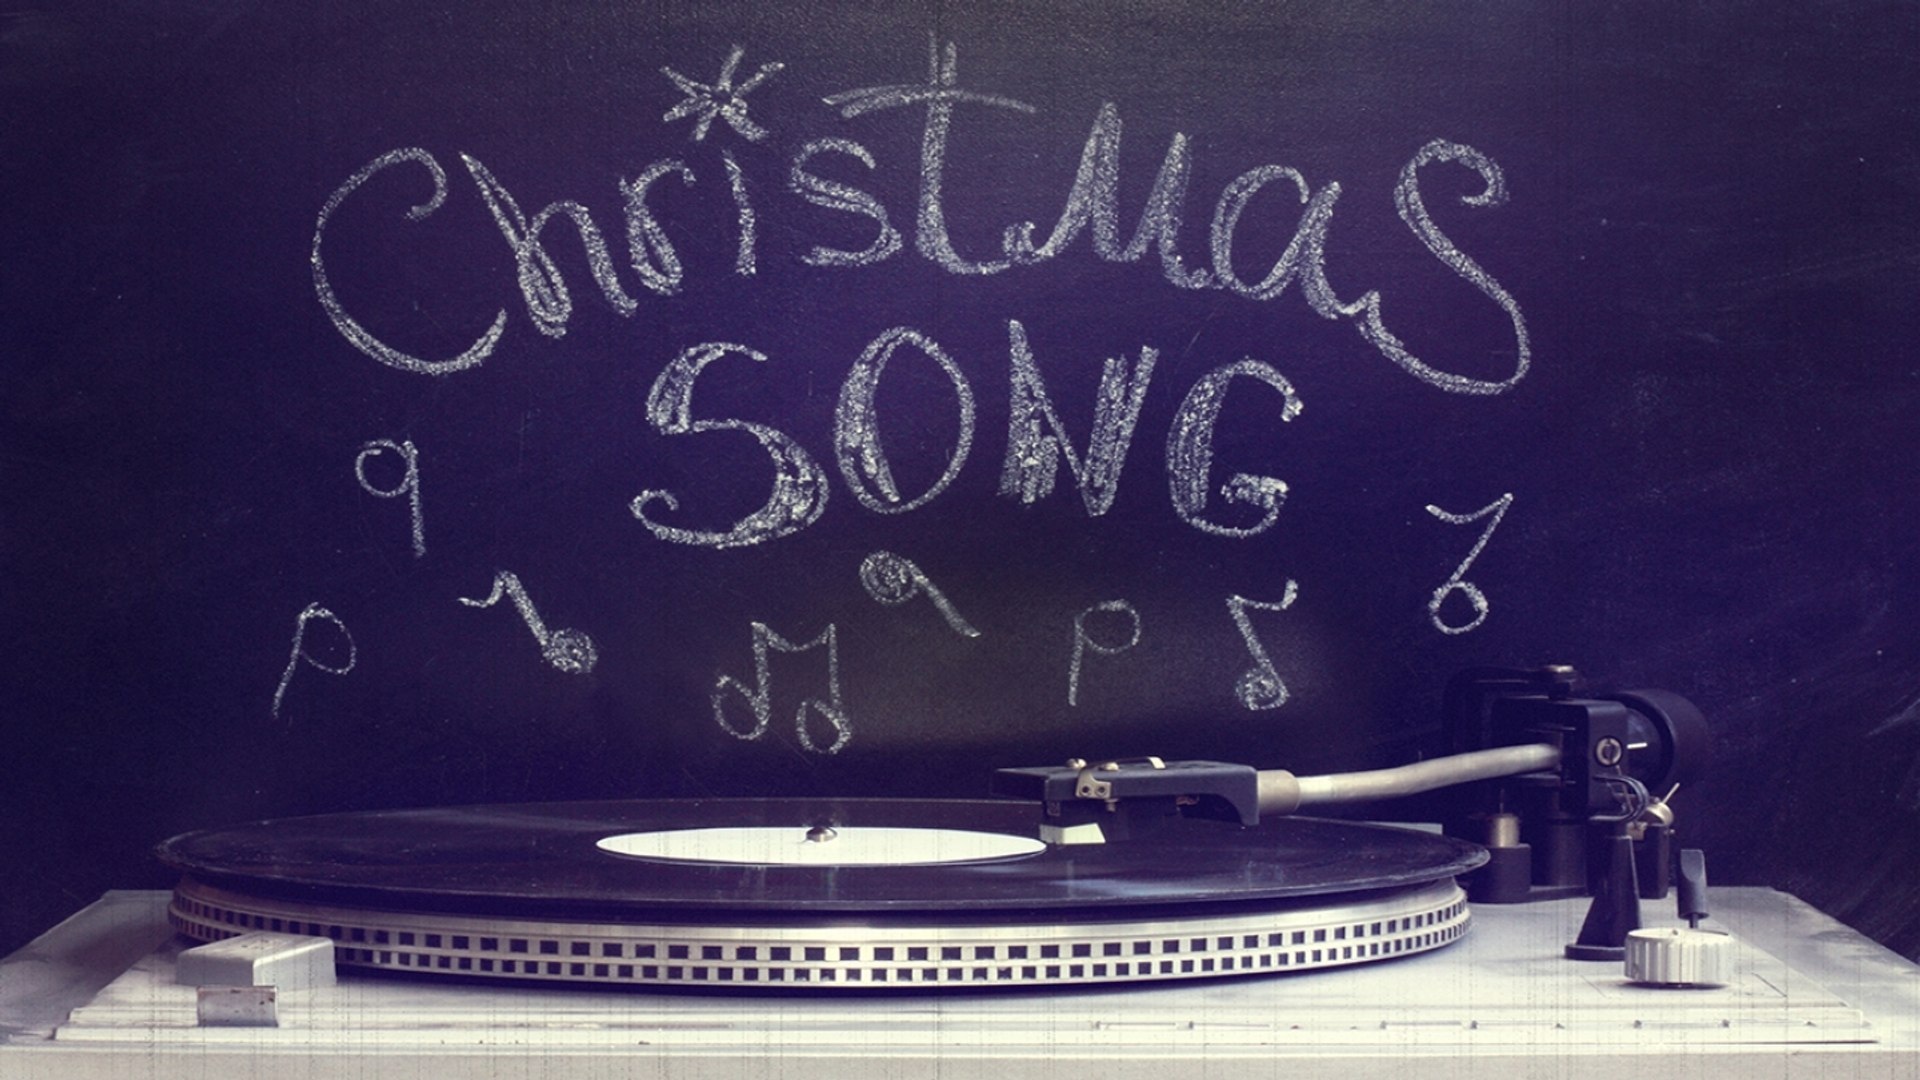 VA - Christmas Songs Mix - Jazz, Classical #Happy Christmas 2018-2019